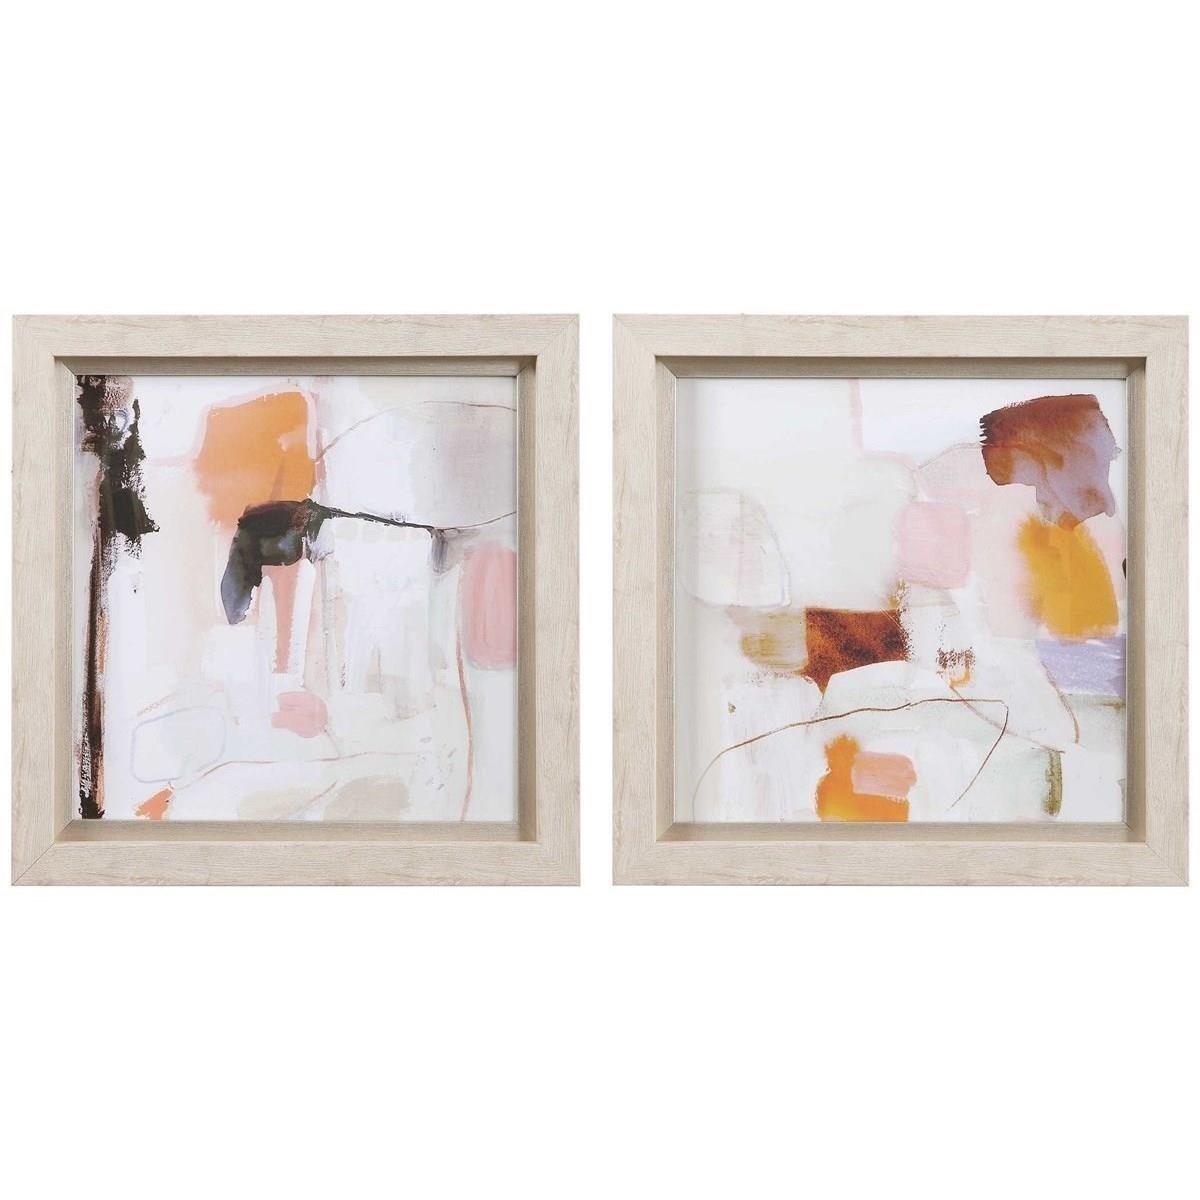 Ravel Framed Prints, Set of 2